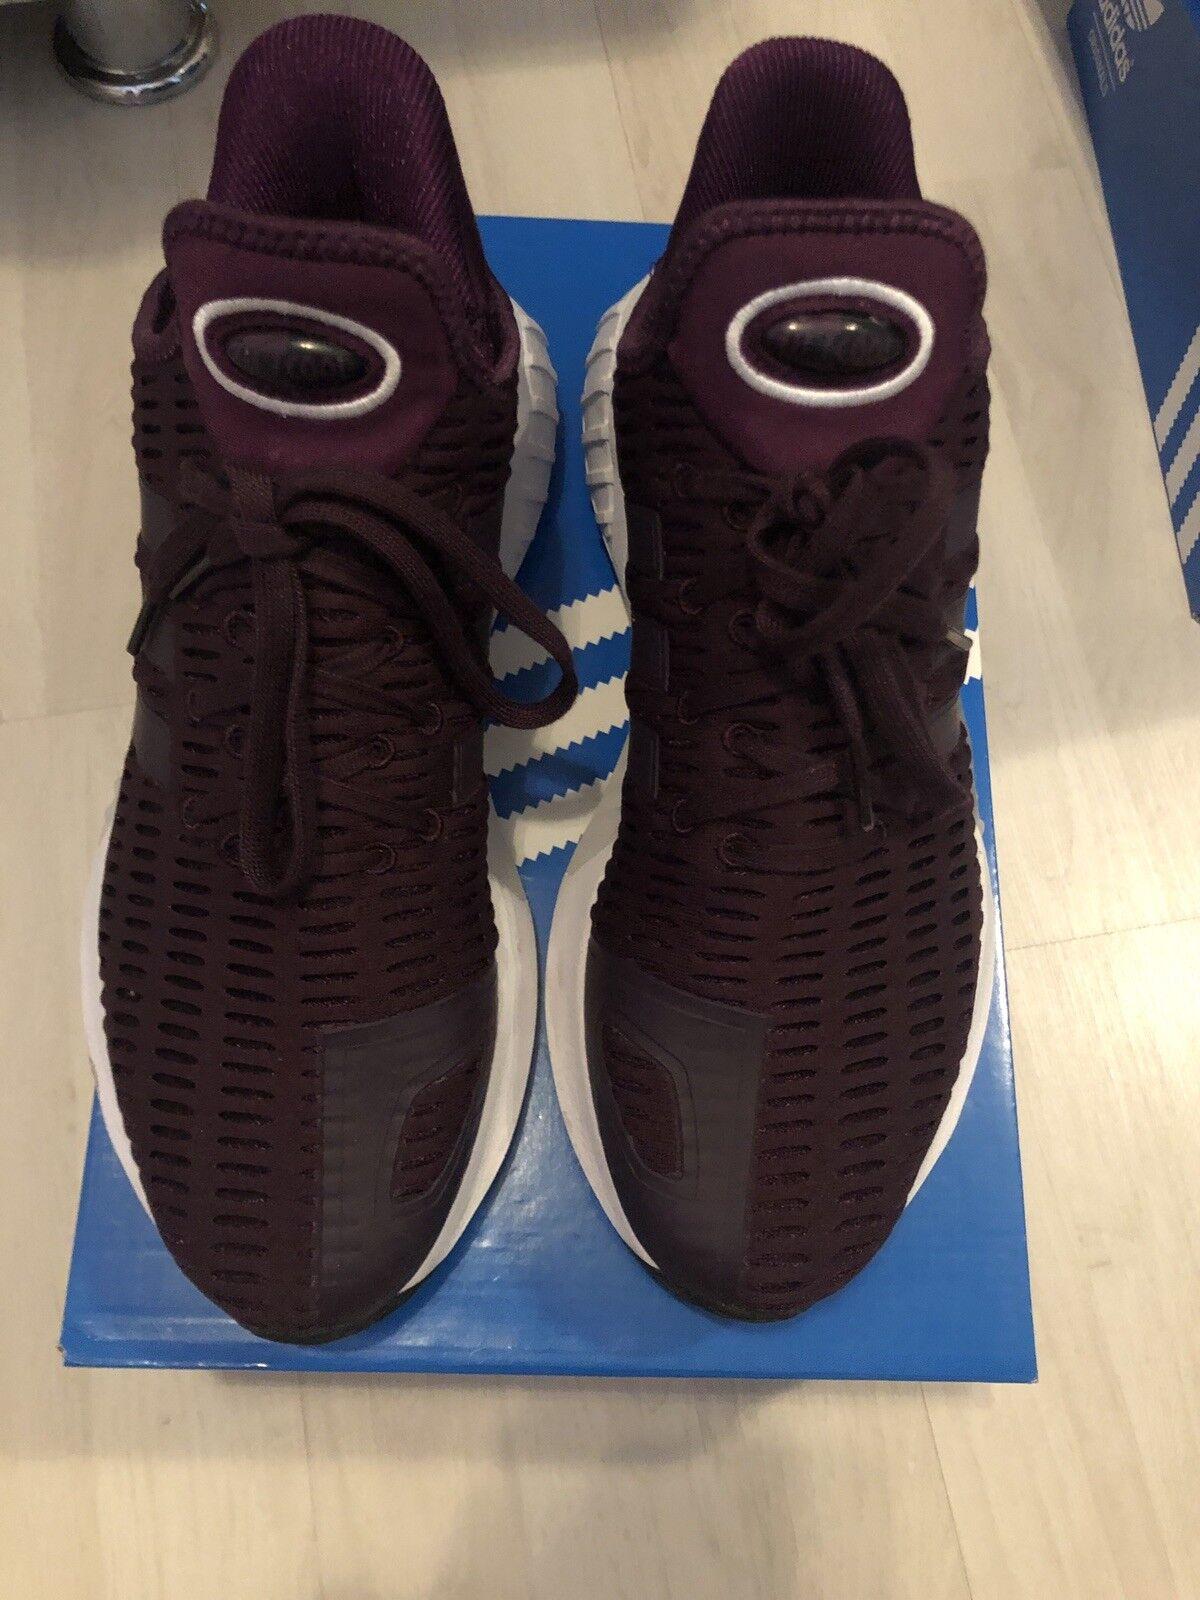 the latest 1445f 5fb68 Adidas Climacool Climacool Climacool 02 17 W Damen Schuhe Turnschuhe Grösse  40 5bbcd9